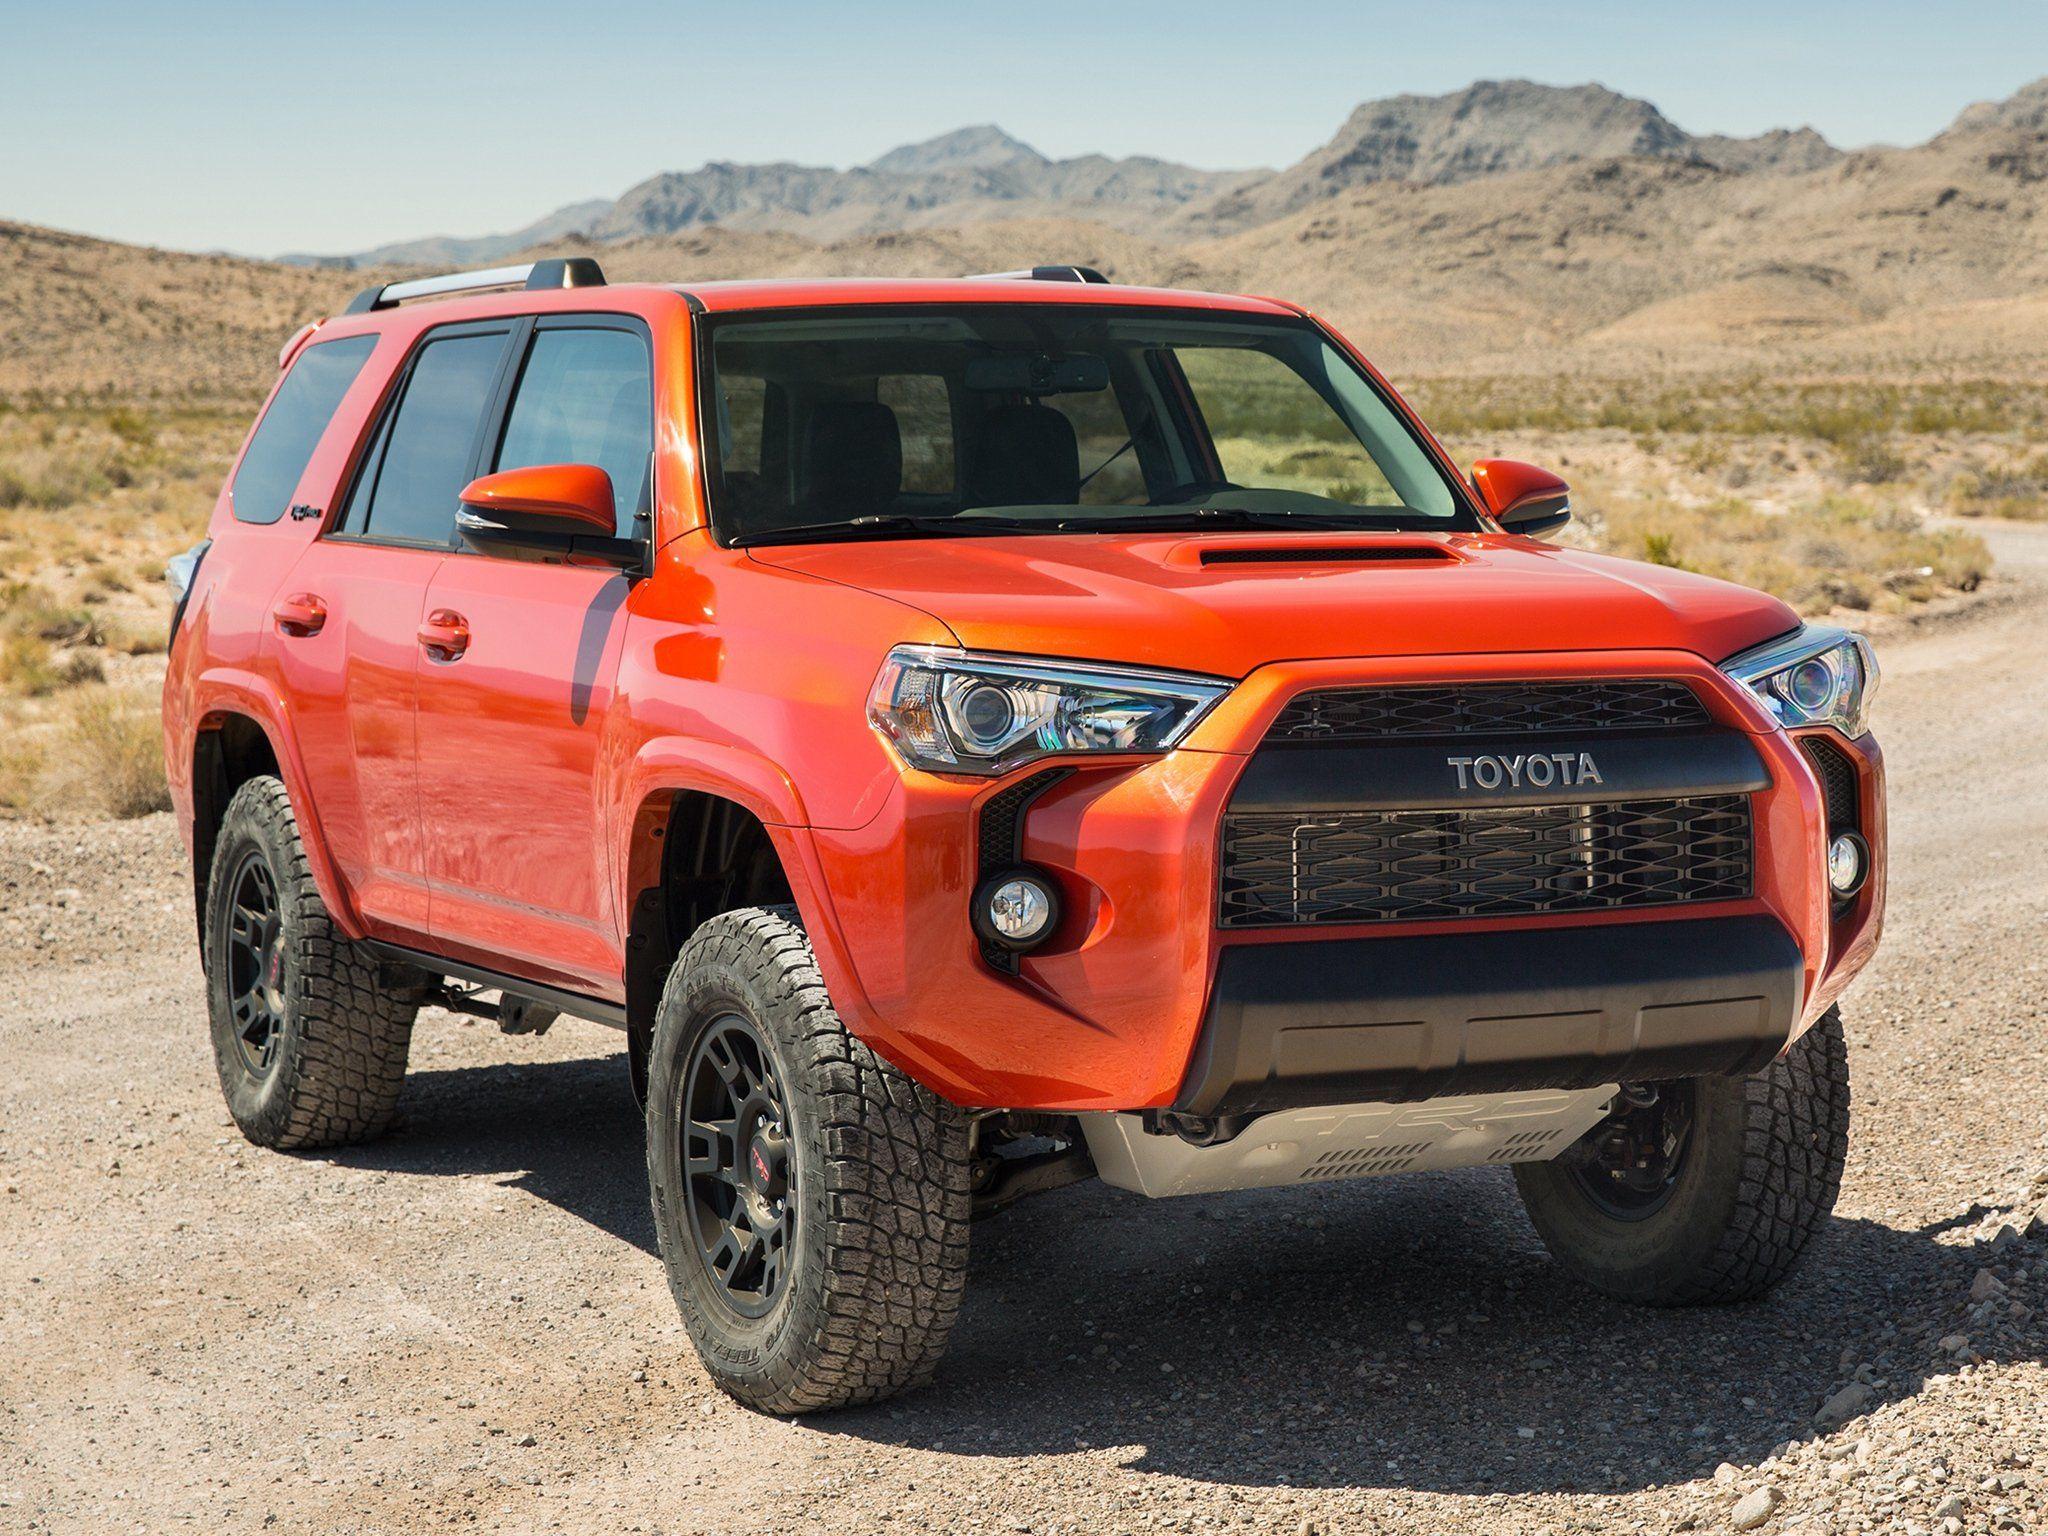 2015 Toyota 4runner Orange Image New Cars Review 2015